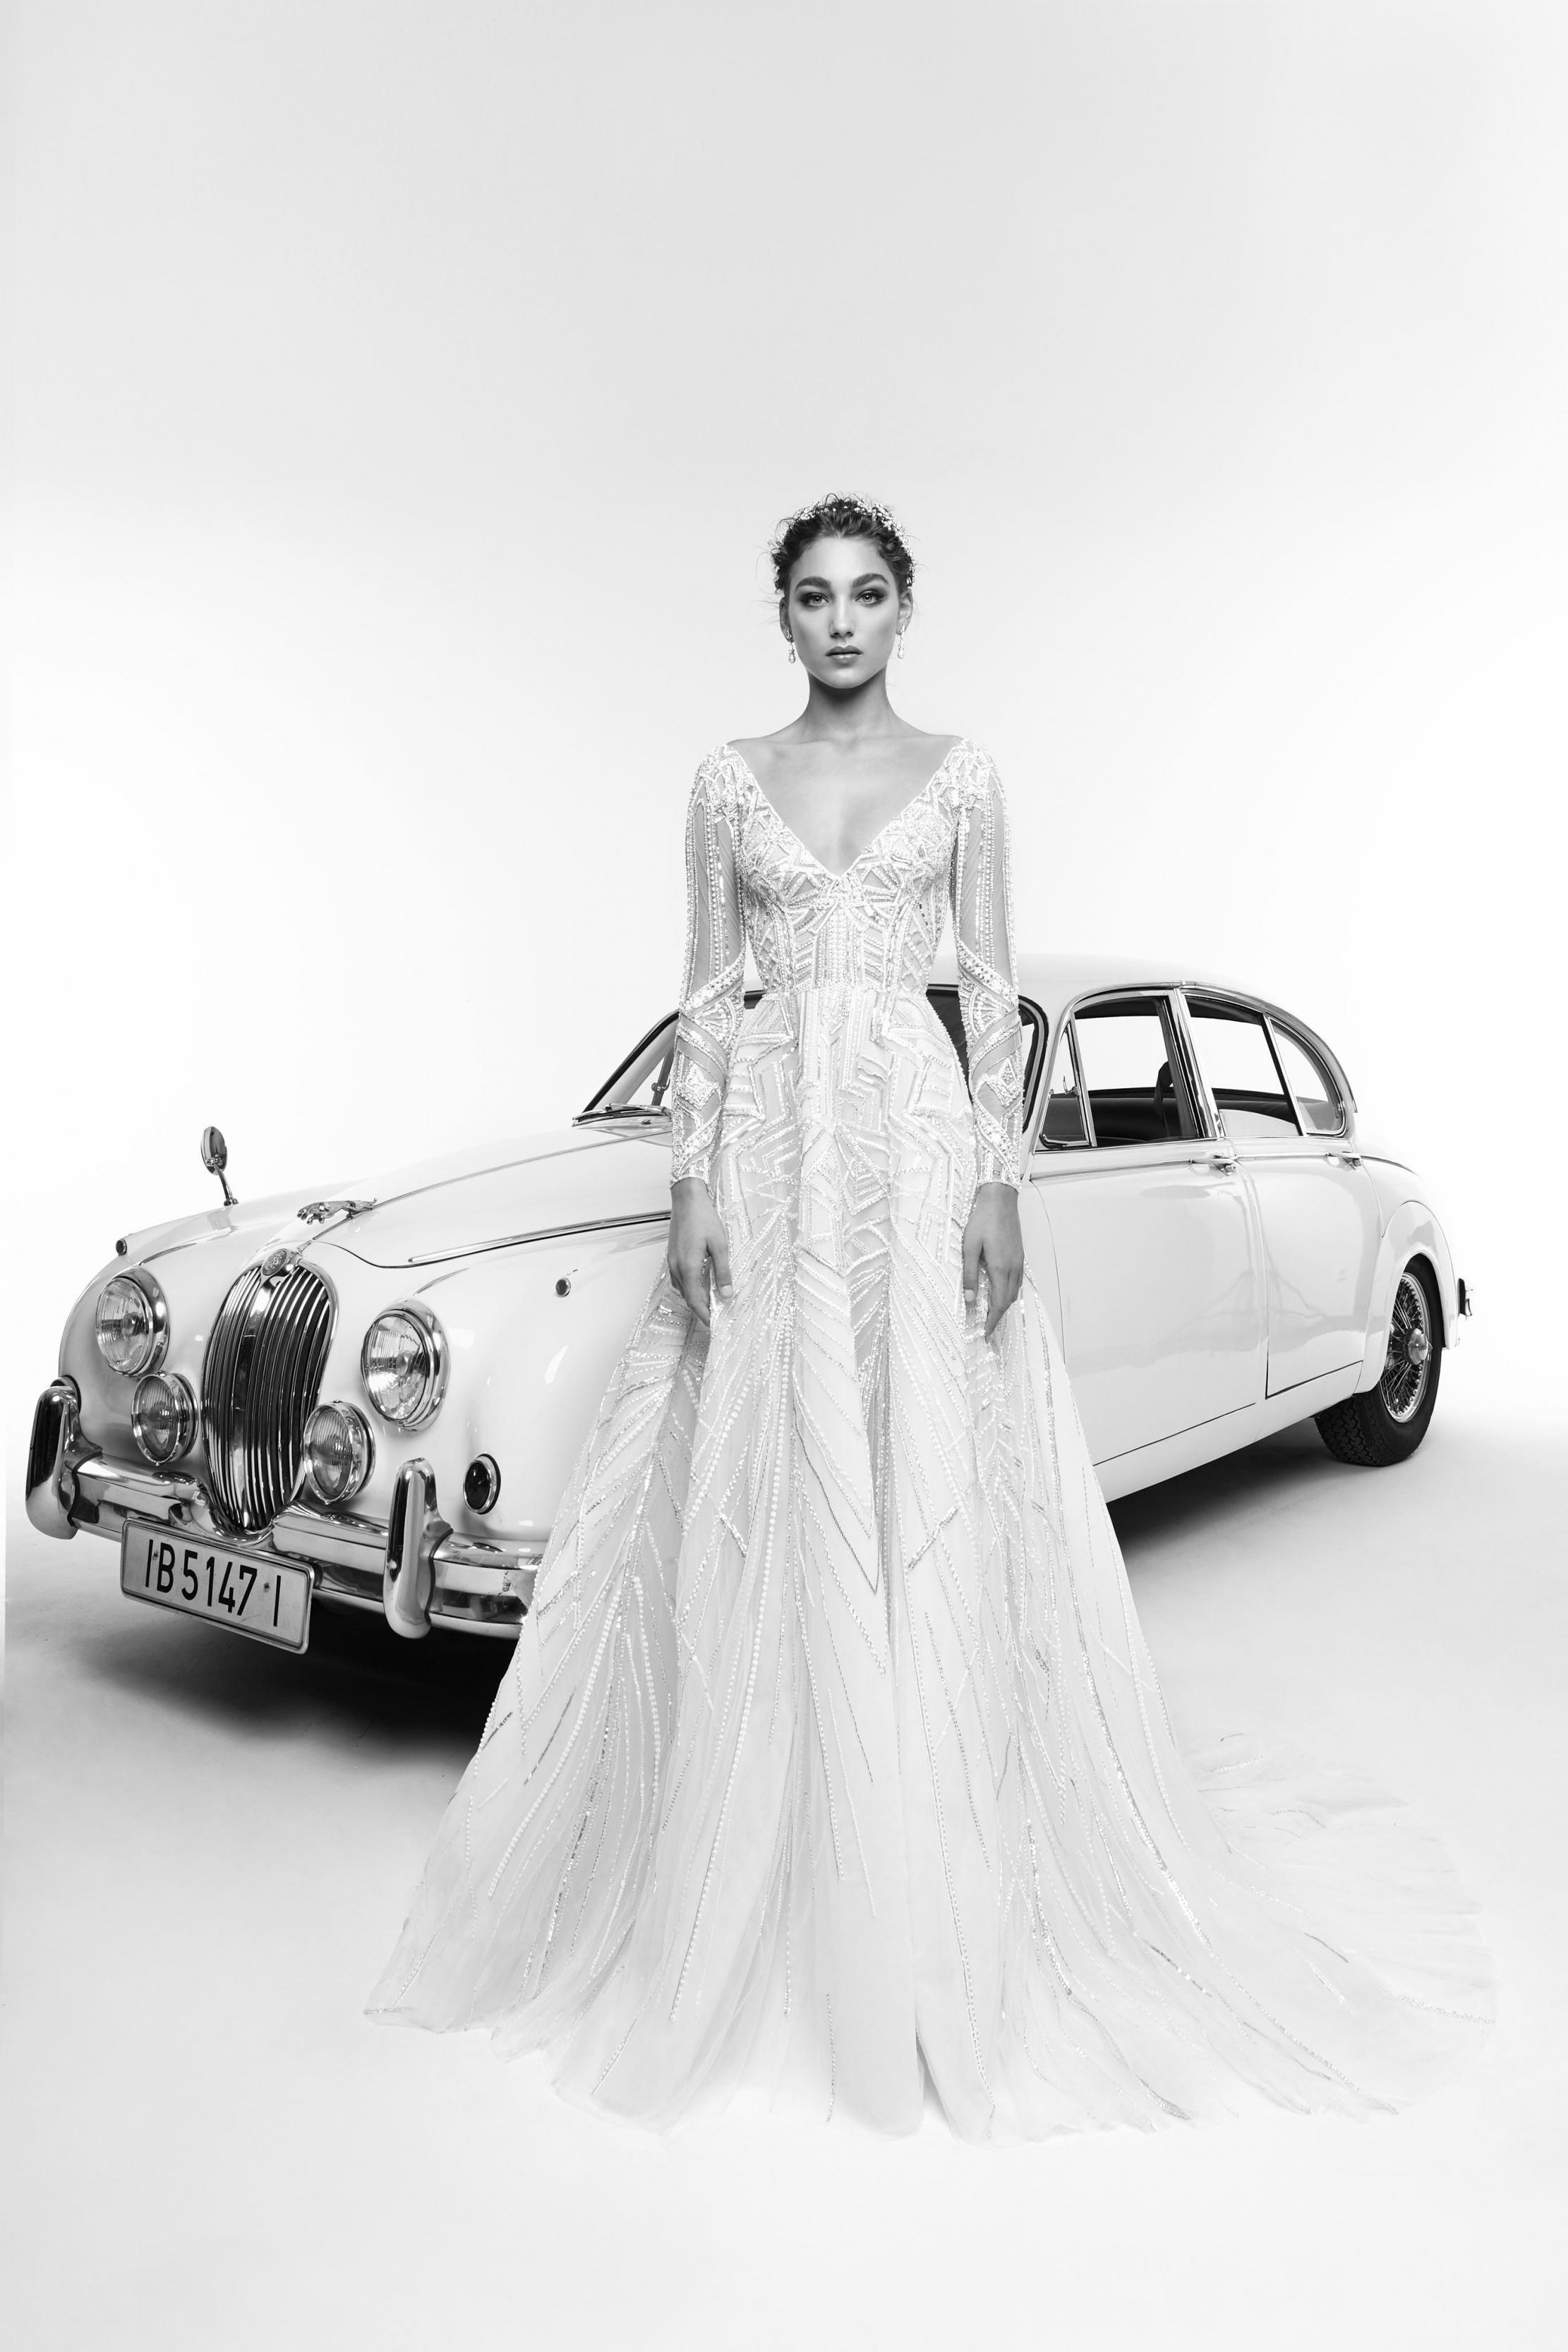 بالصور فساتين زفاف زهير مراد 2019 , فساتين زفاف زهير مراد واجمد فساتين 5814 8